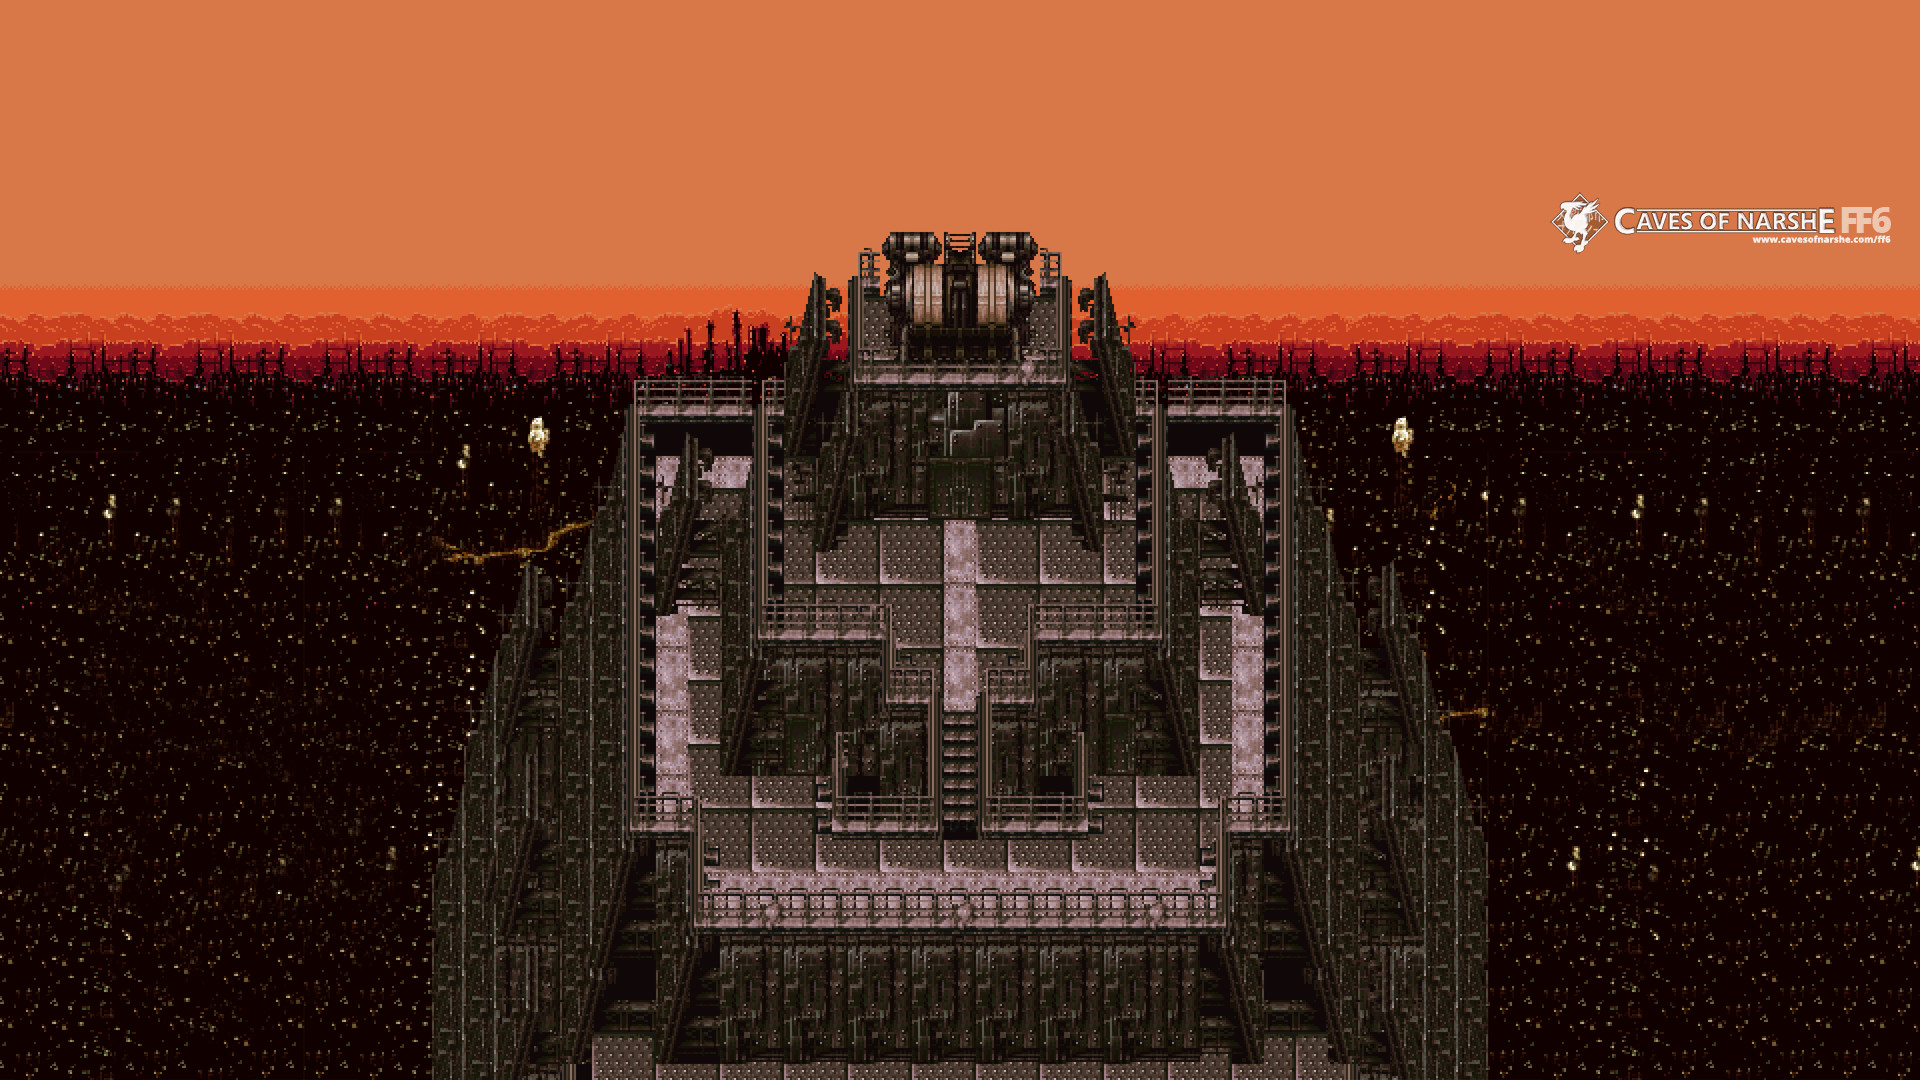 Final Fantasy VI Wallpapers – Wallpaper Cave